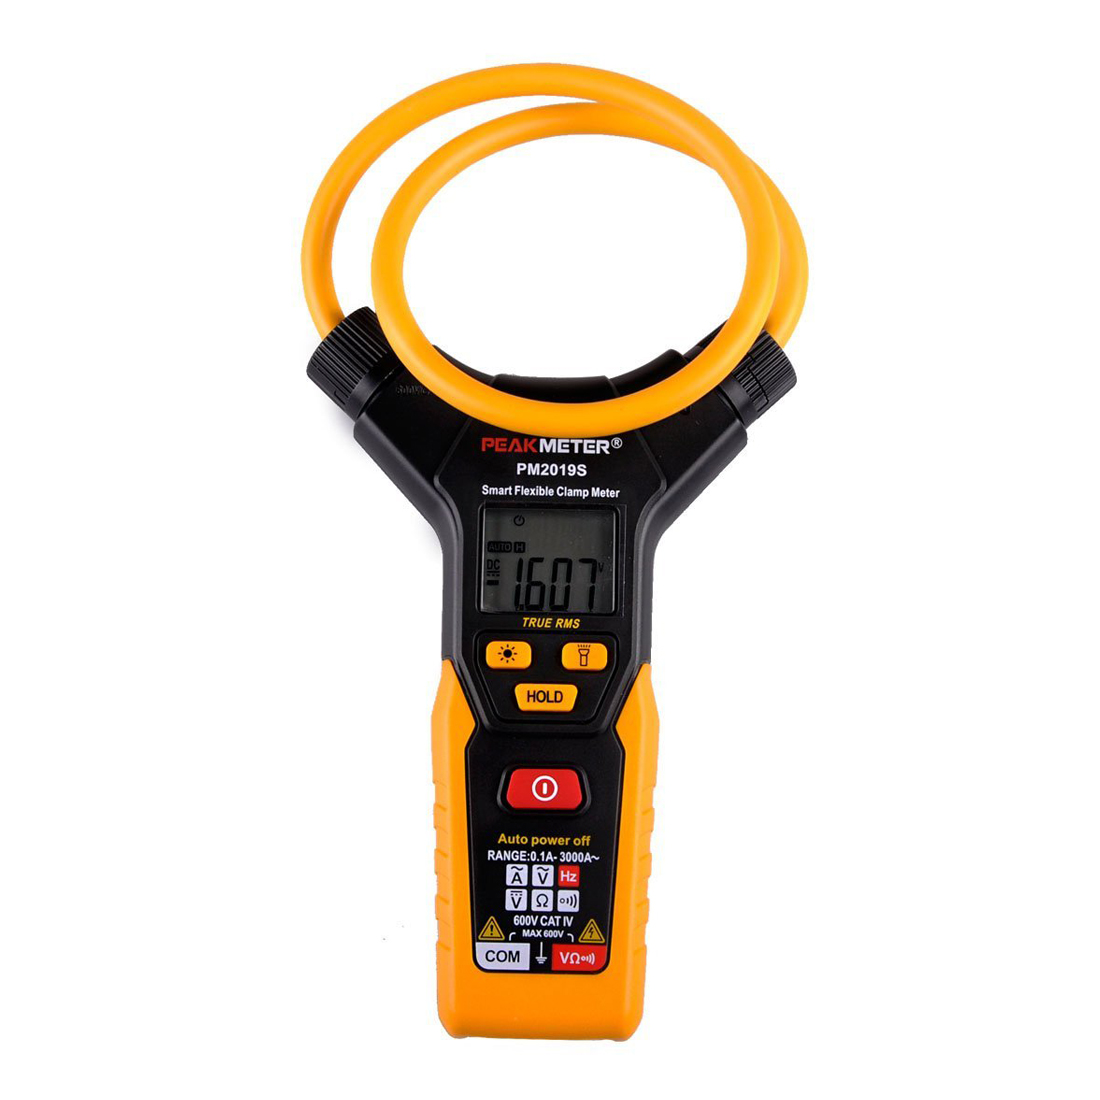 HHTL-PEAKMETER PM2019S Digital Flexible Clamp Meter Smart AC DC Multimeter Voltage Tester svodka ot strelkova 19 06 2014 2019 s pometkoj srochno